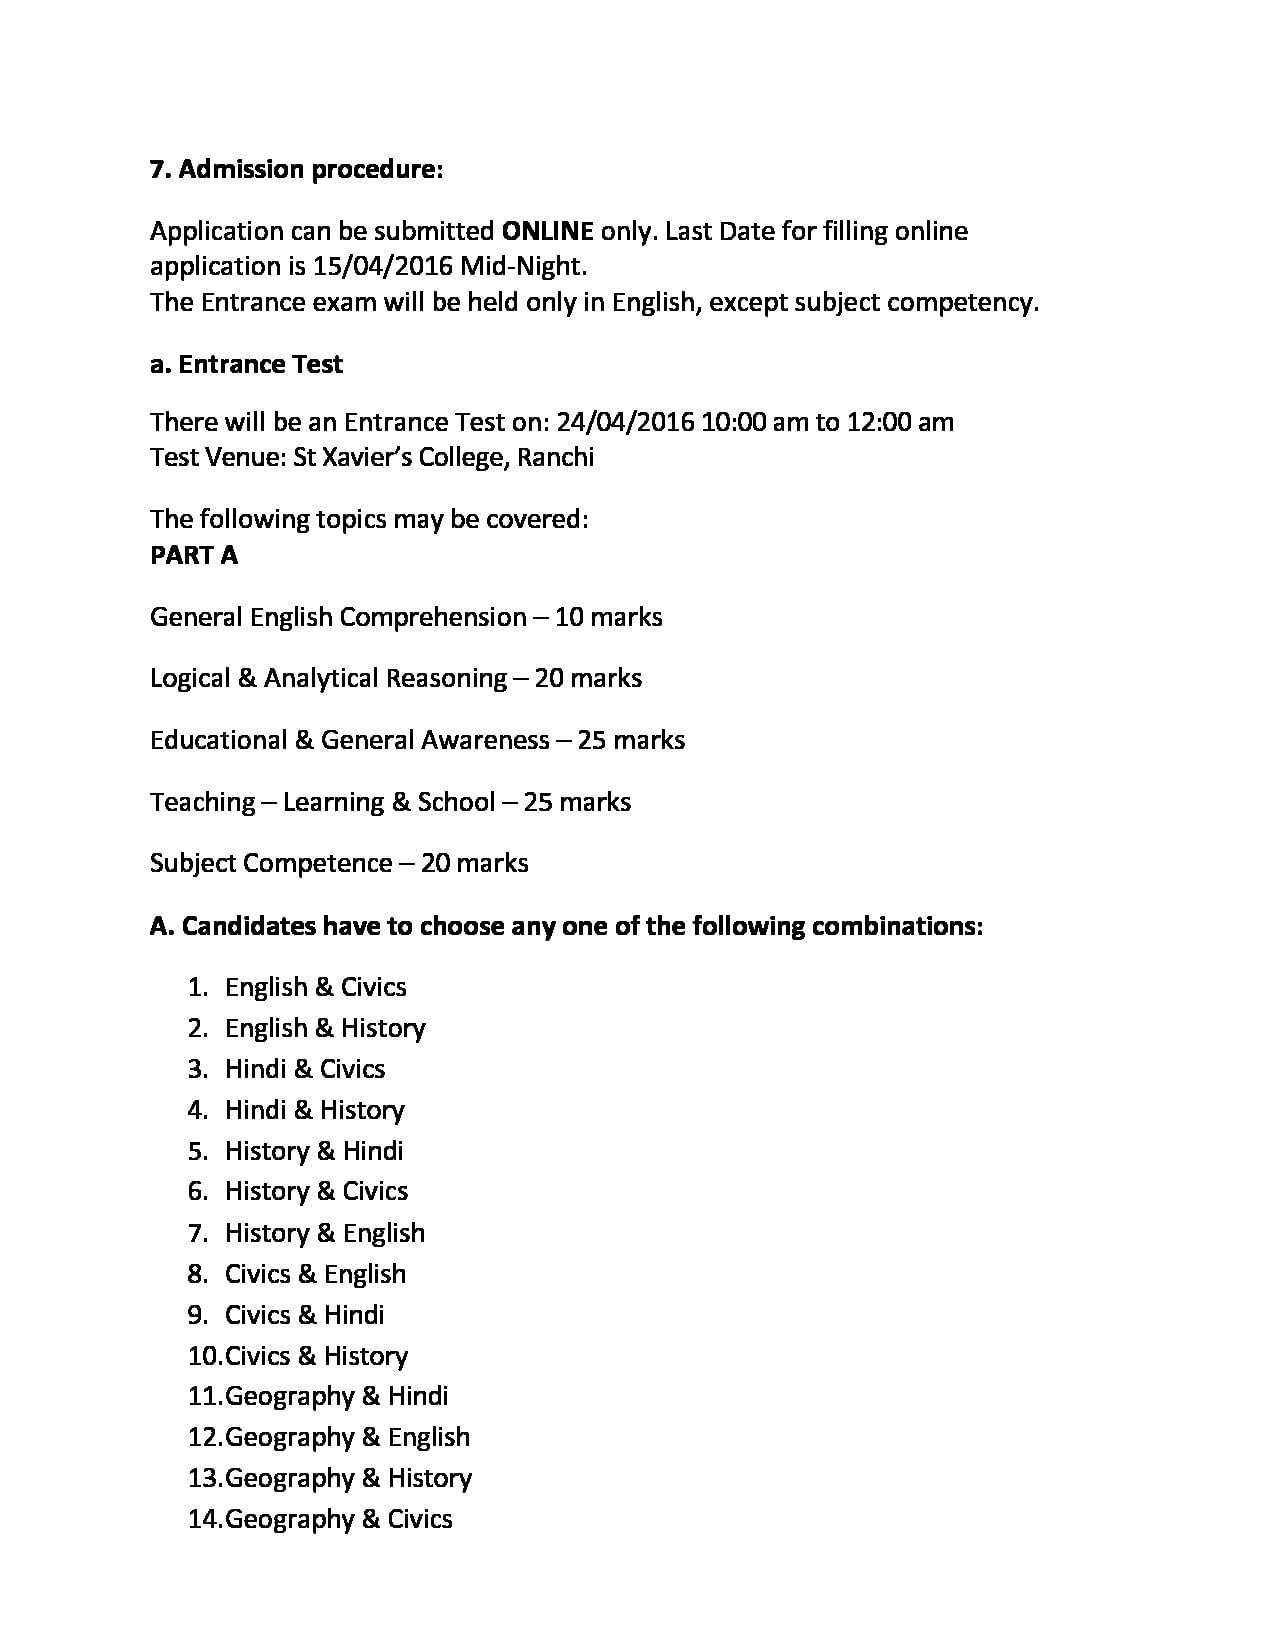 wits postgraduate prospectus 2019 pdf